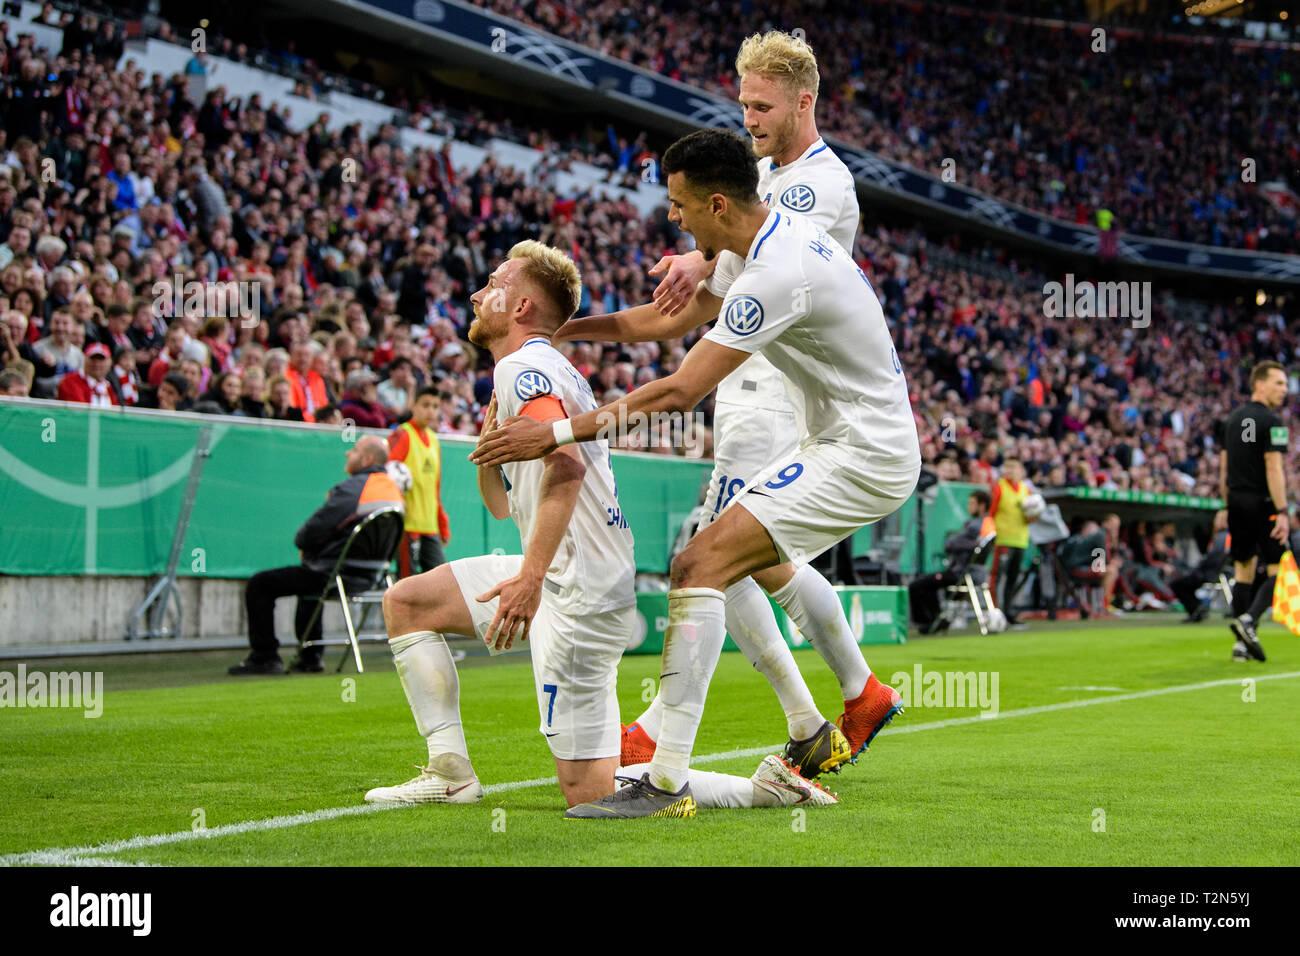 03 April 2019 Bayern Munchen Fussball Dfb Pokal Fc